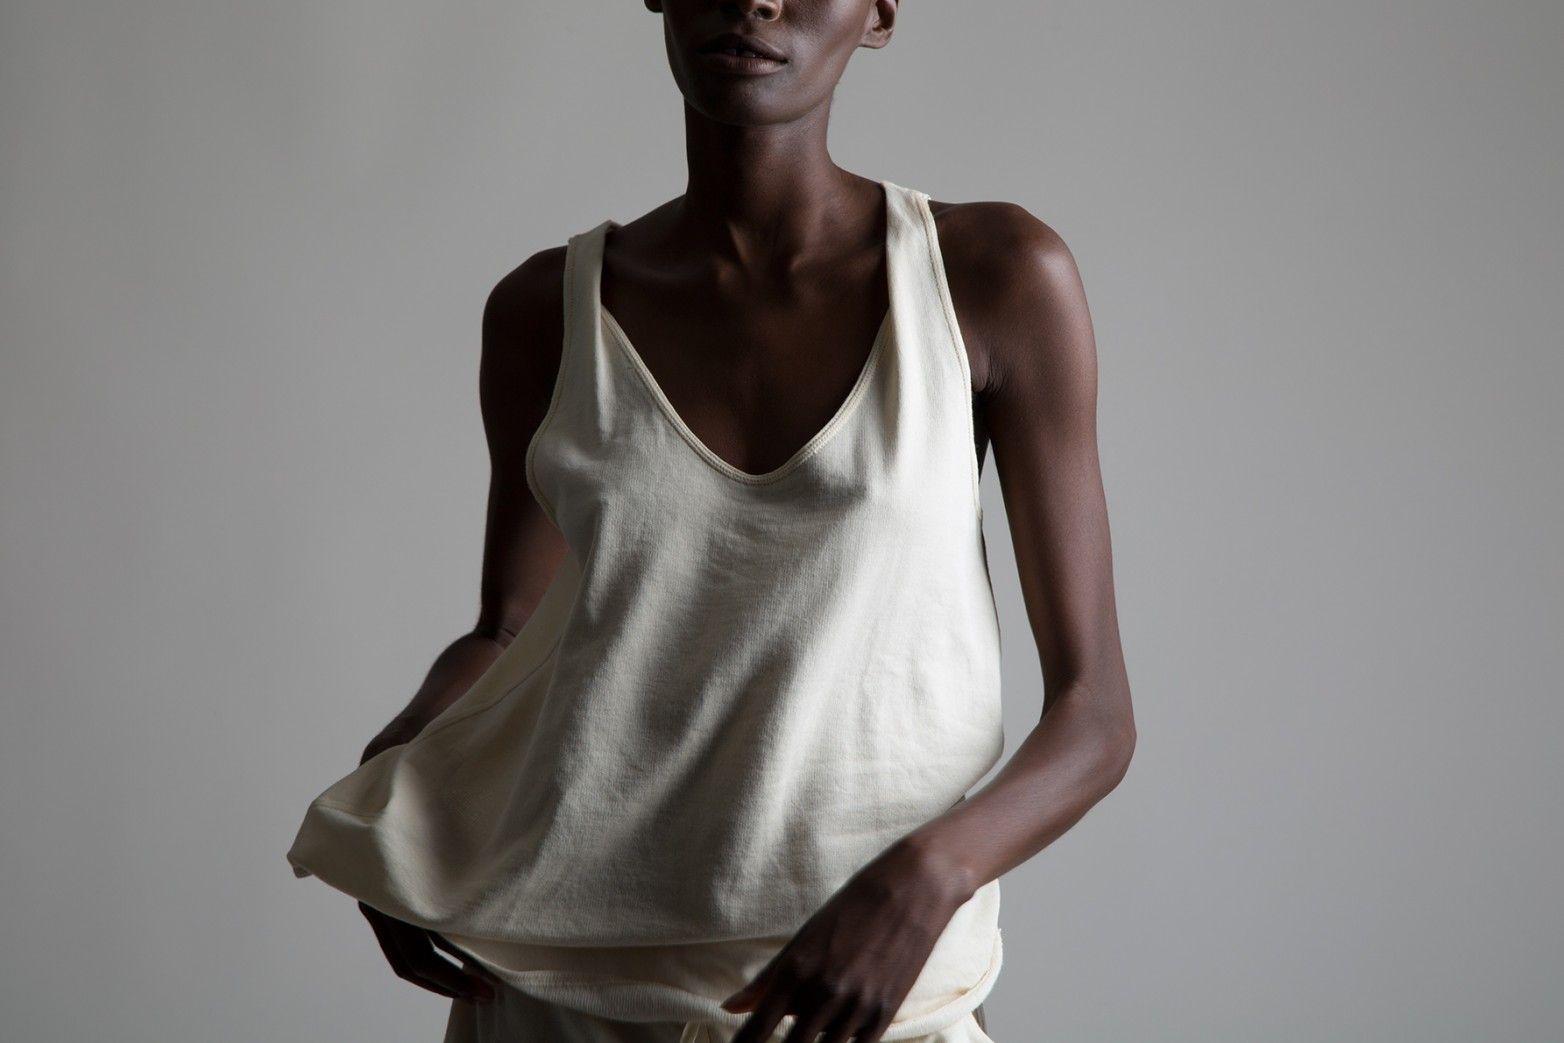 Bottega Veneta Outfit Designer Vintage Clothing Minimal Fashion